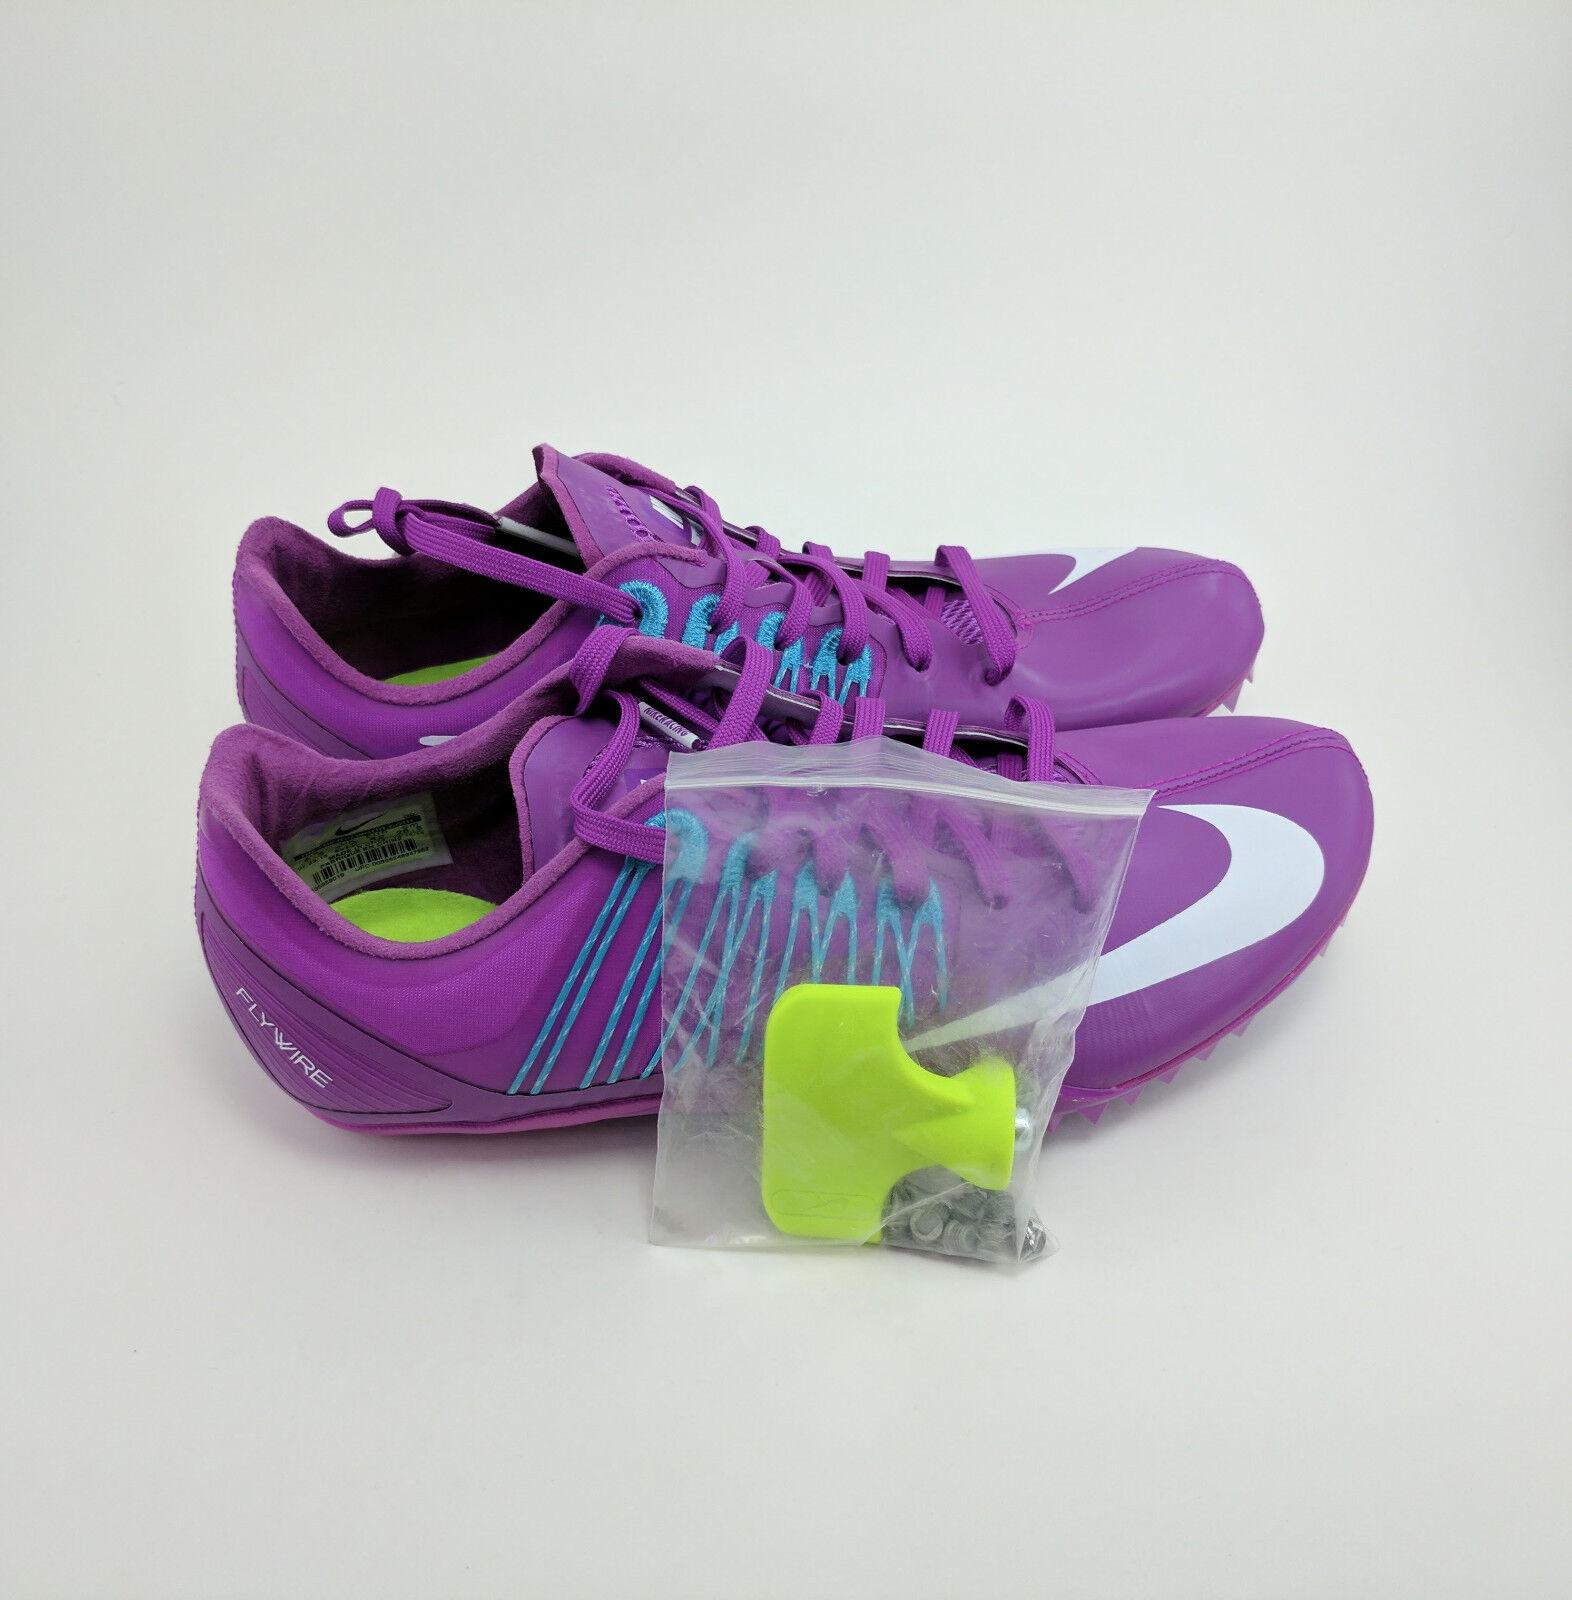 NEW NEW NEW Nike Zoom Celar 5 Track Sprint Spikes Hyper purple Purple Sz 14.5 629226-514 2b9766